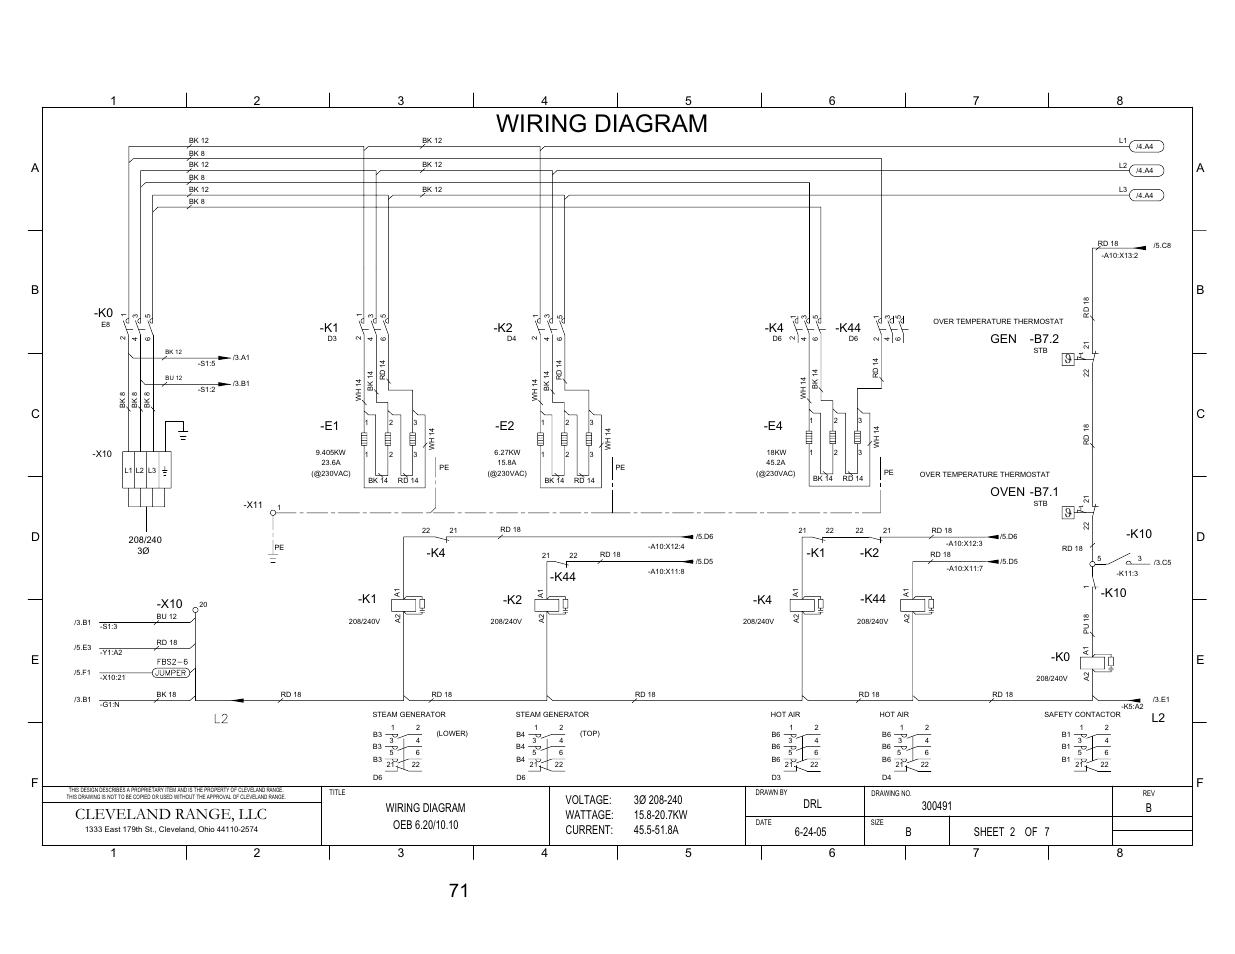 Pg 2  Wiring Diagram  Cleveland Range  Llc